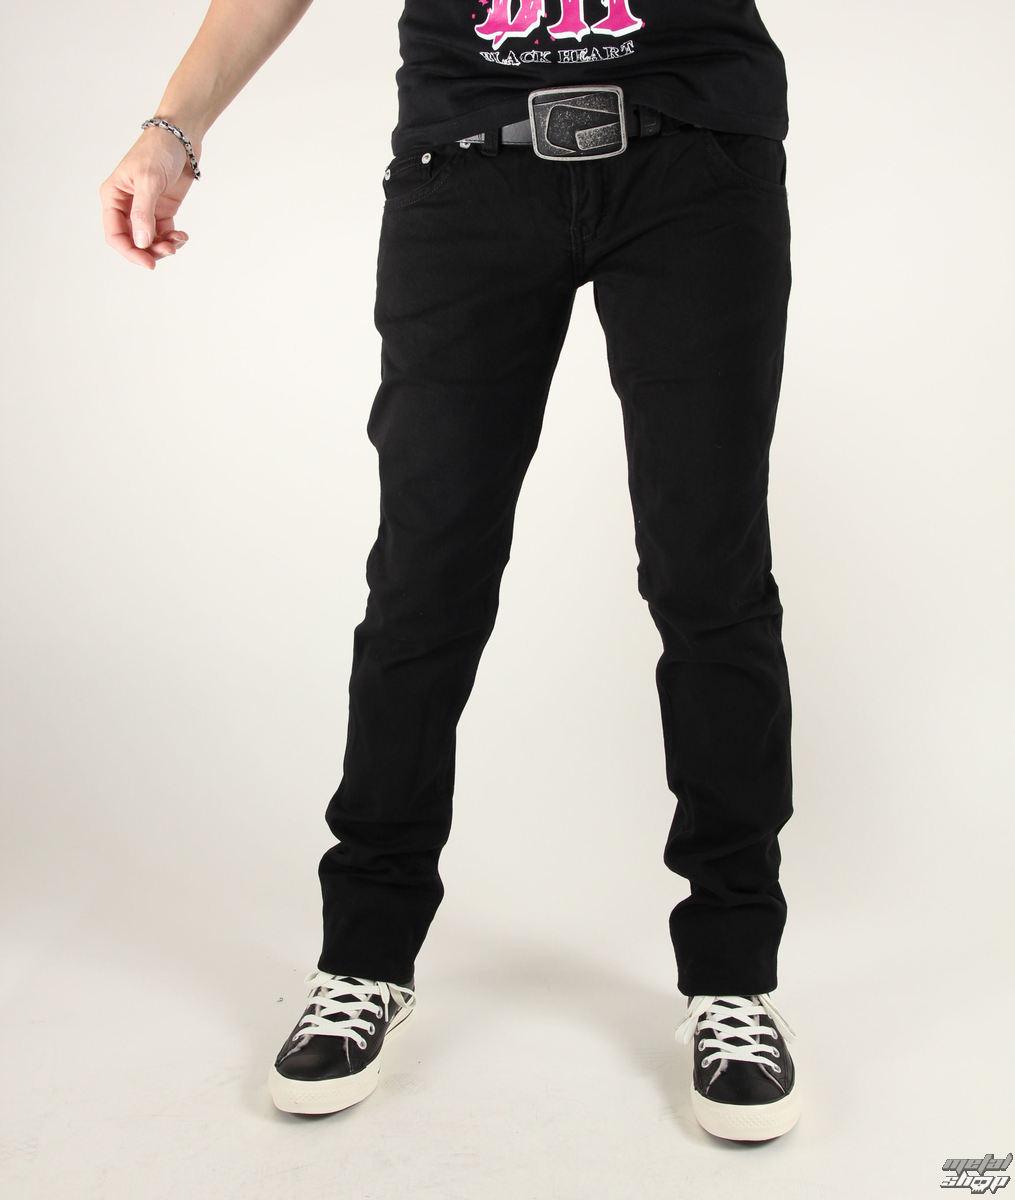 nohavice dámske 3RDAND56th - Zips Back Skinny Jeans - JM1024